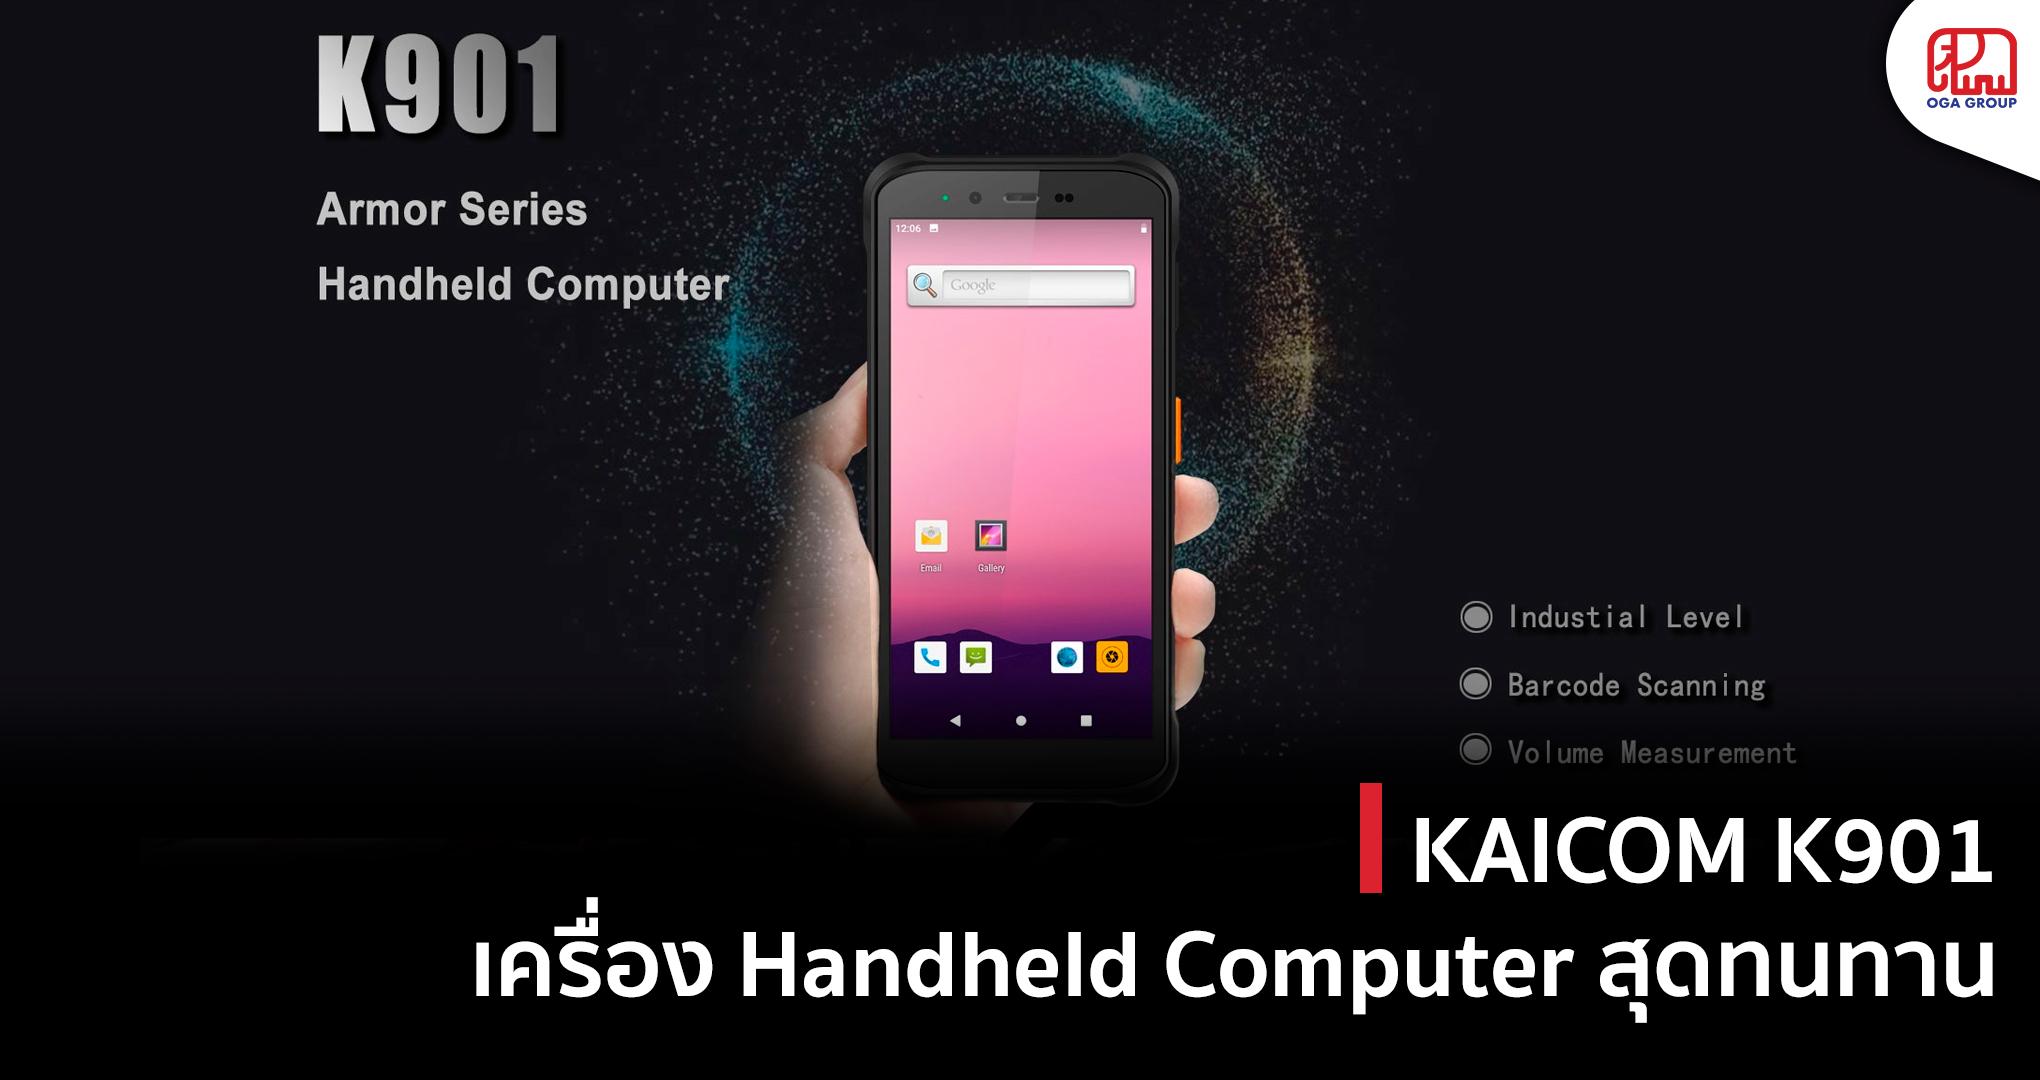 KAICOM K901 เครื่อง Handheld Computer สุดทนทาน